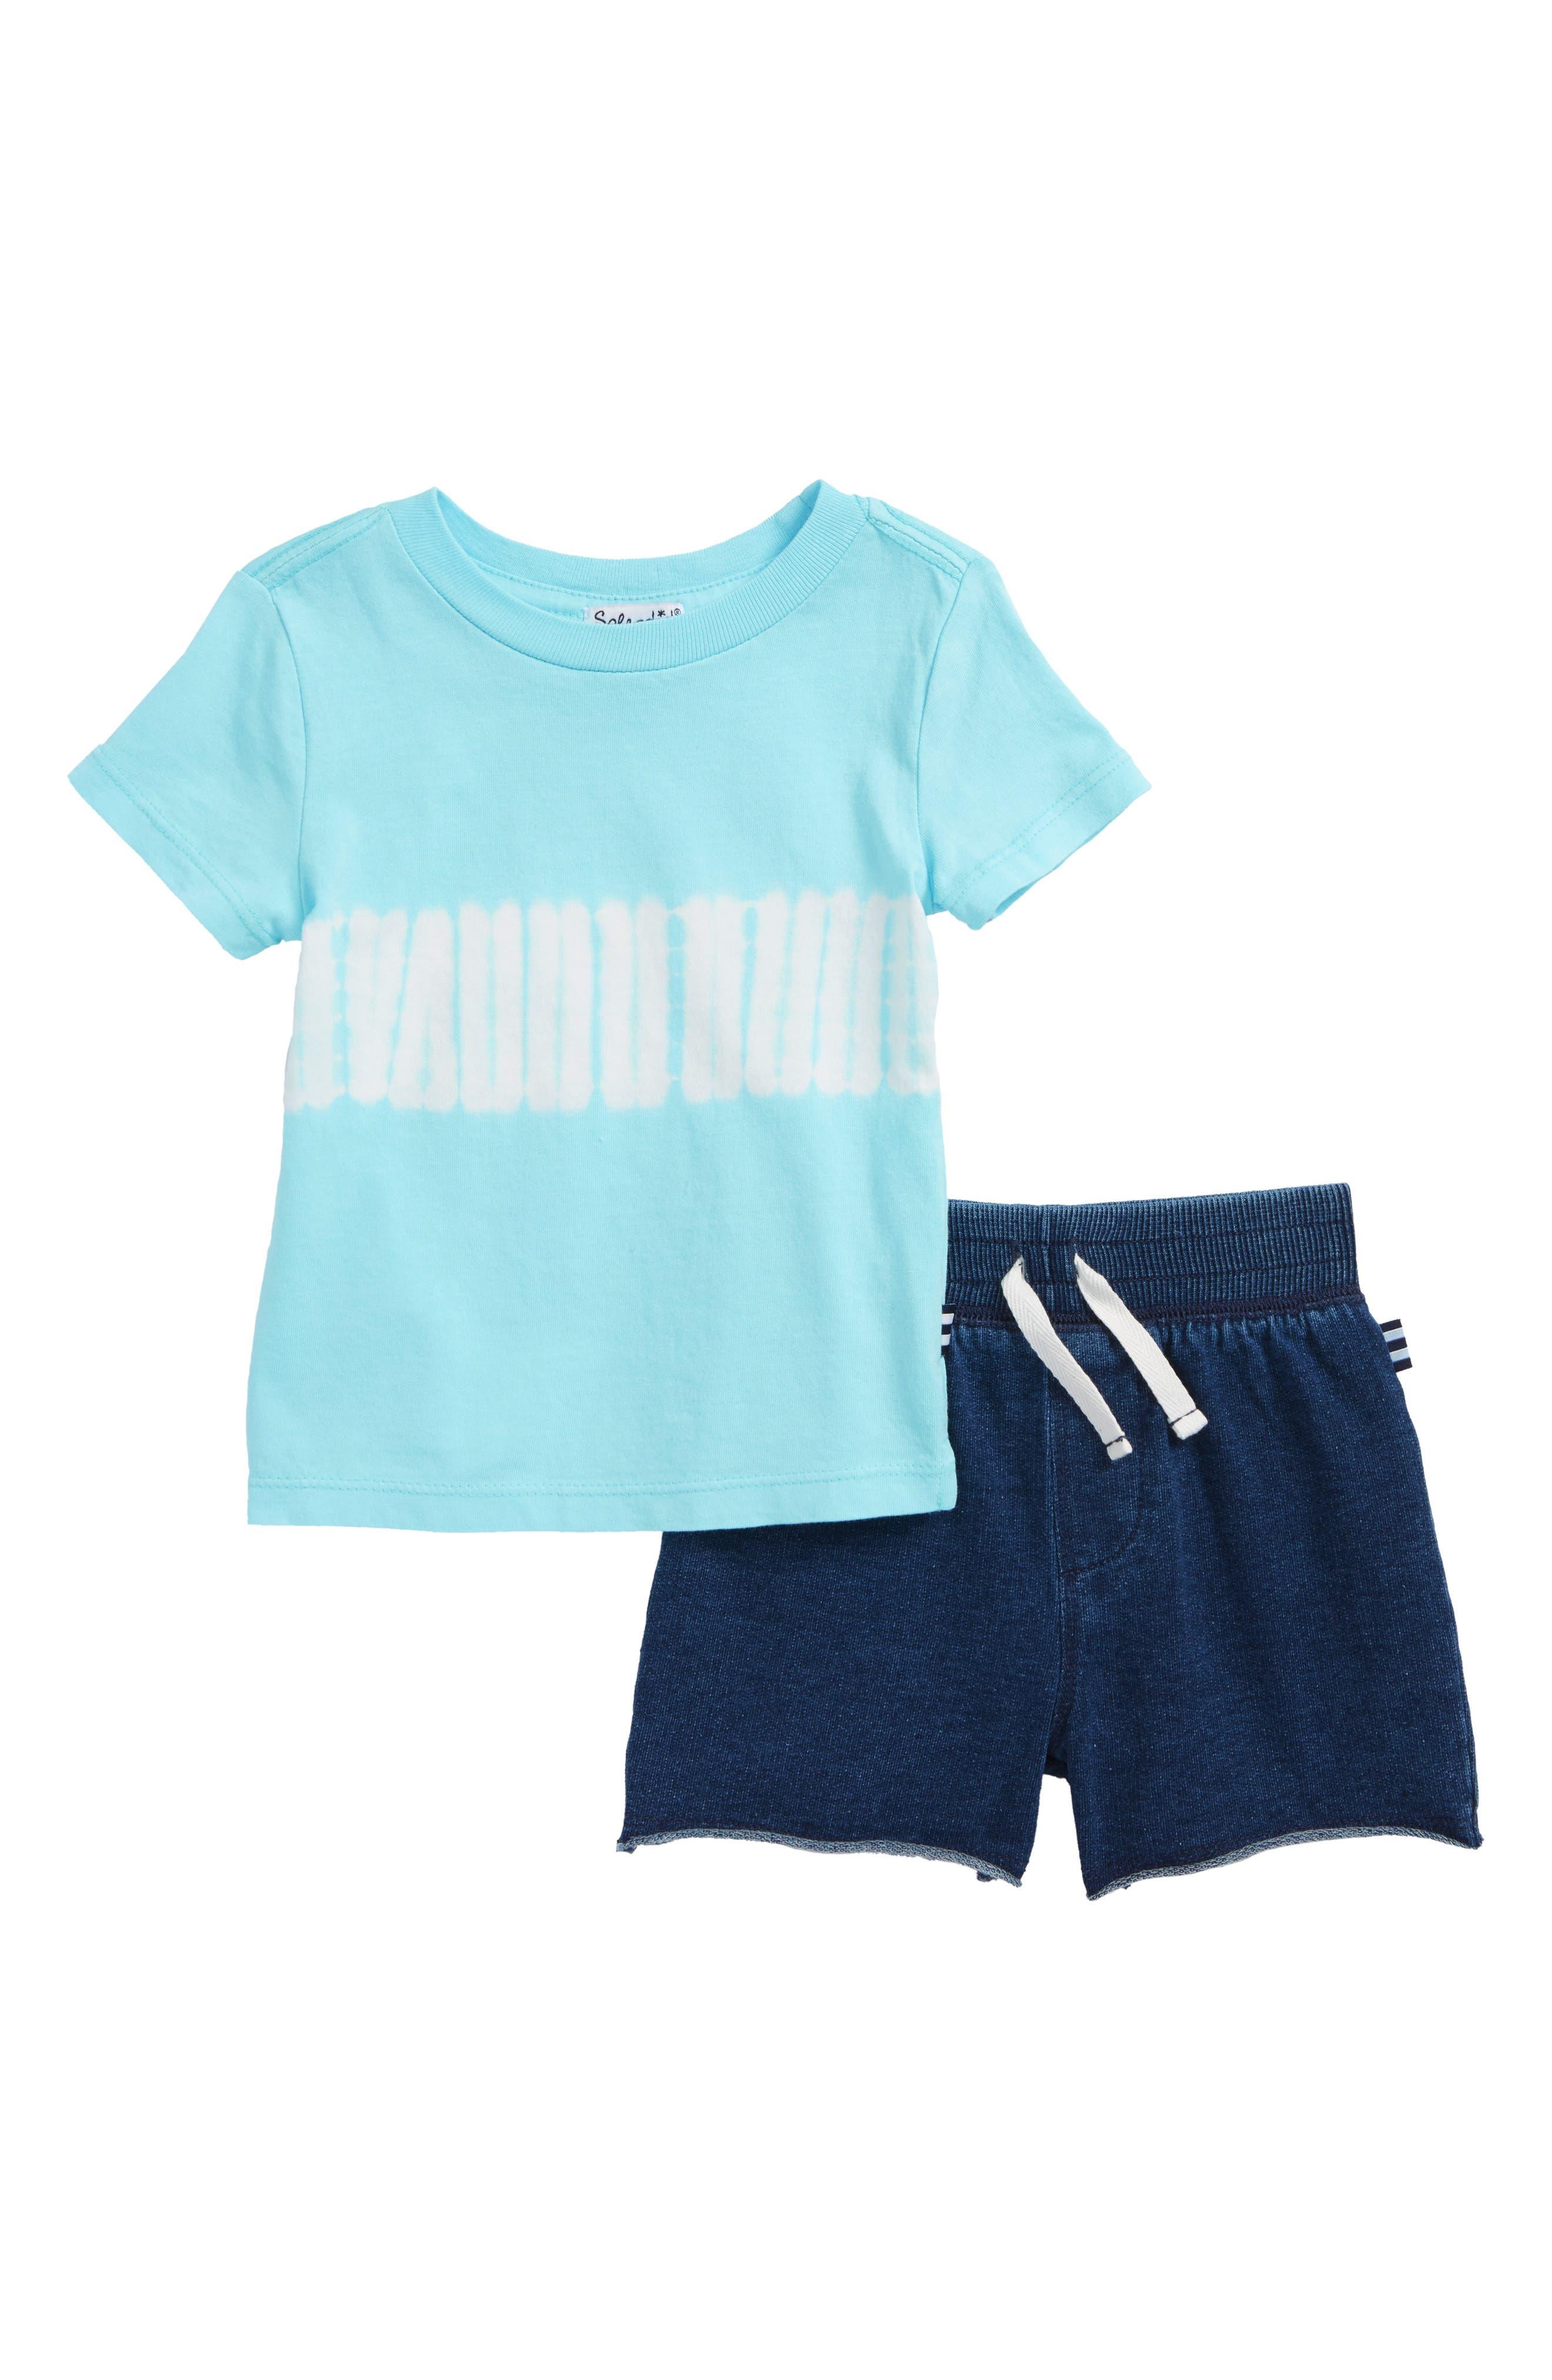 Tie Dye T-Shirt & Shorts Set,                             Main thumbnail 1, color,                             Aqua Haze